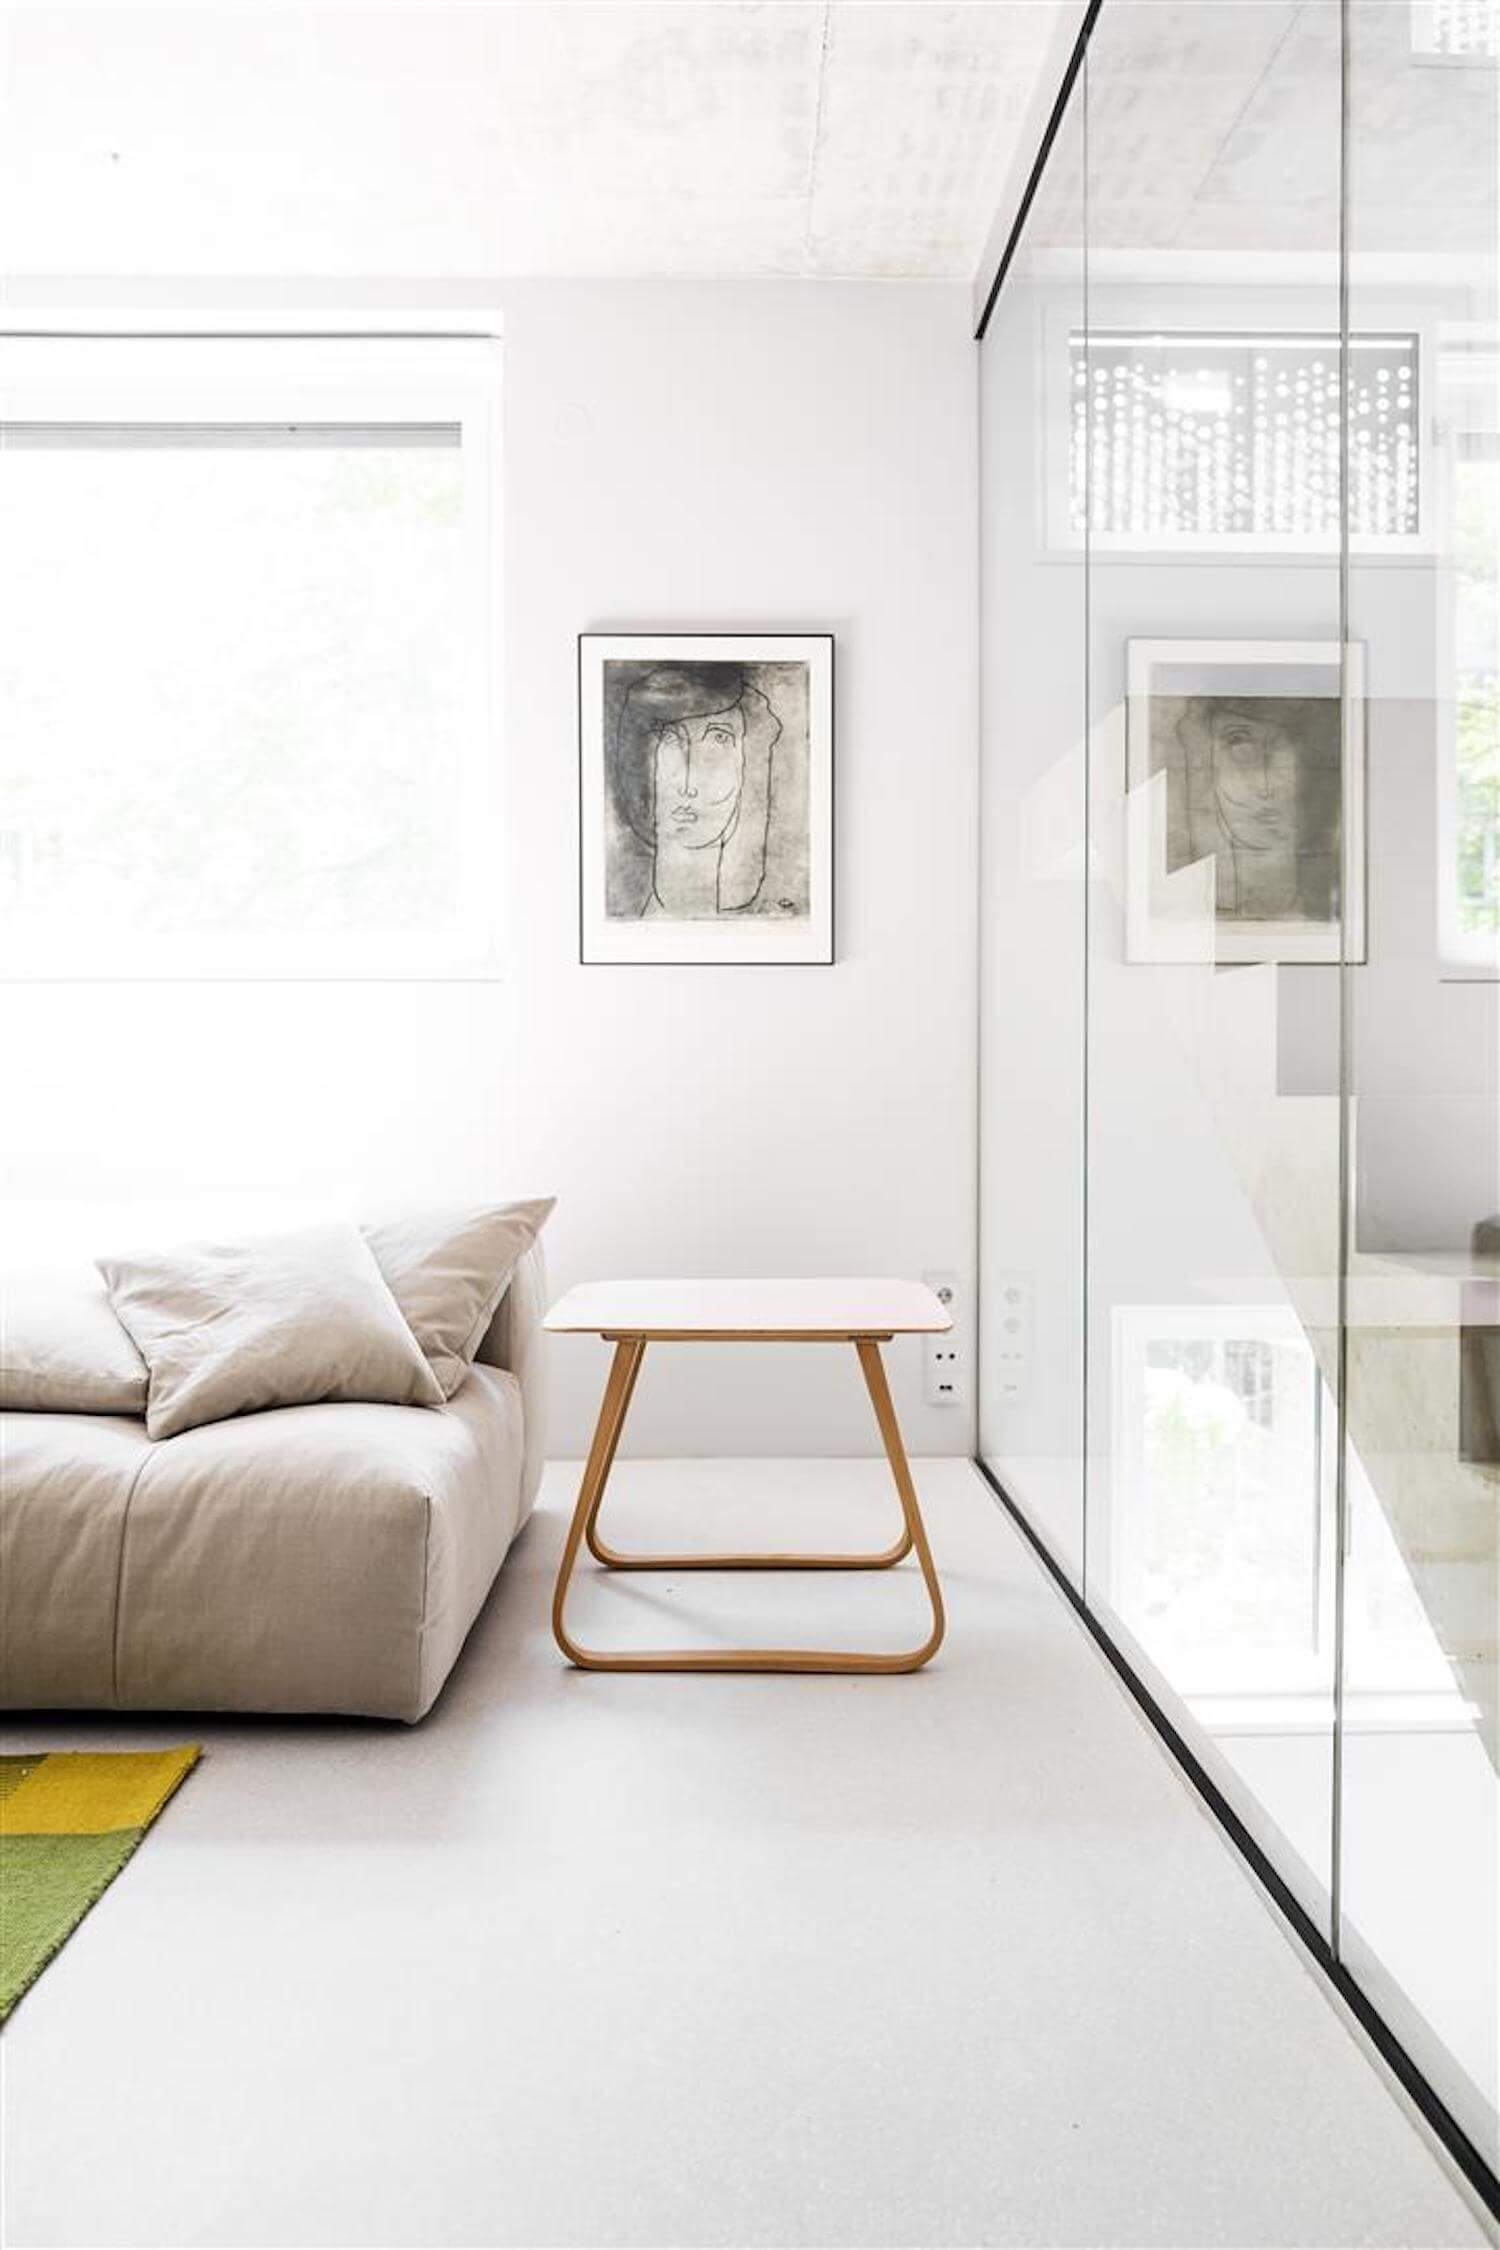 prenzlauer berg residence by loft kolasinski est living. Black Bedroom Furniture Sets. Home Design Ideas